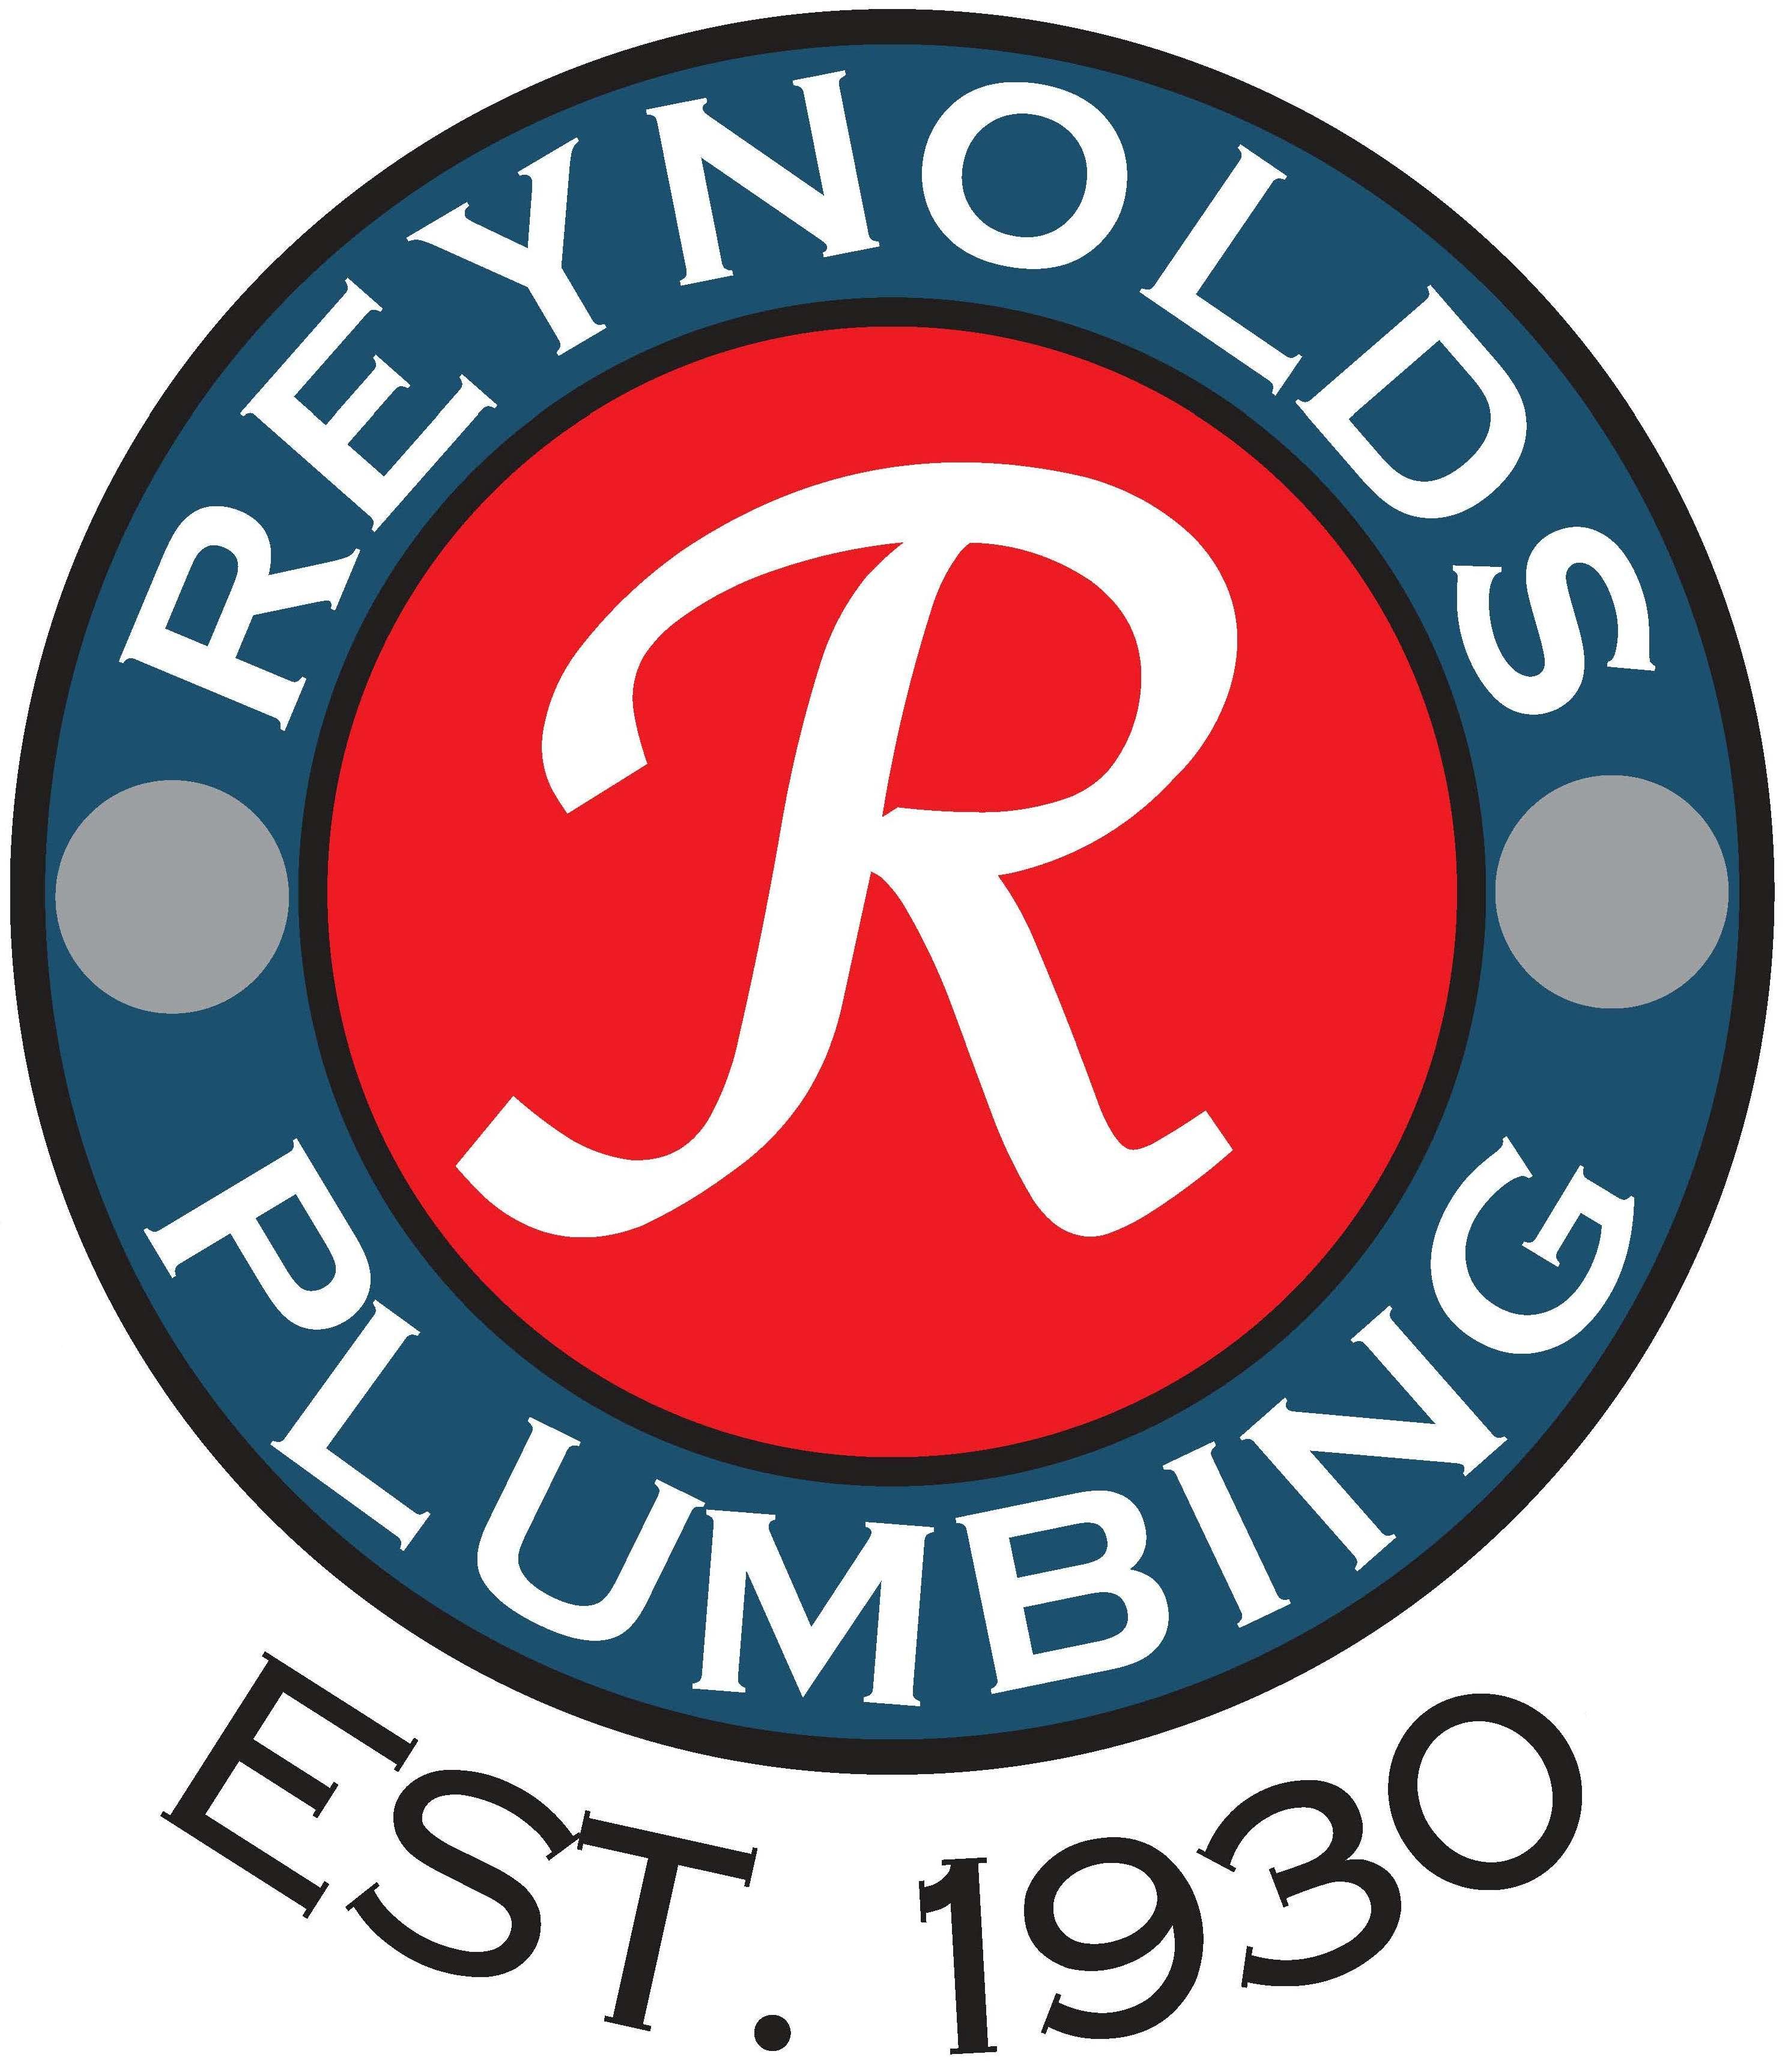 Reynolds Plumbing, Heating & Cooling